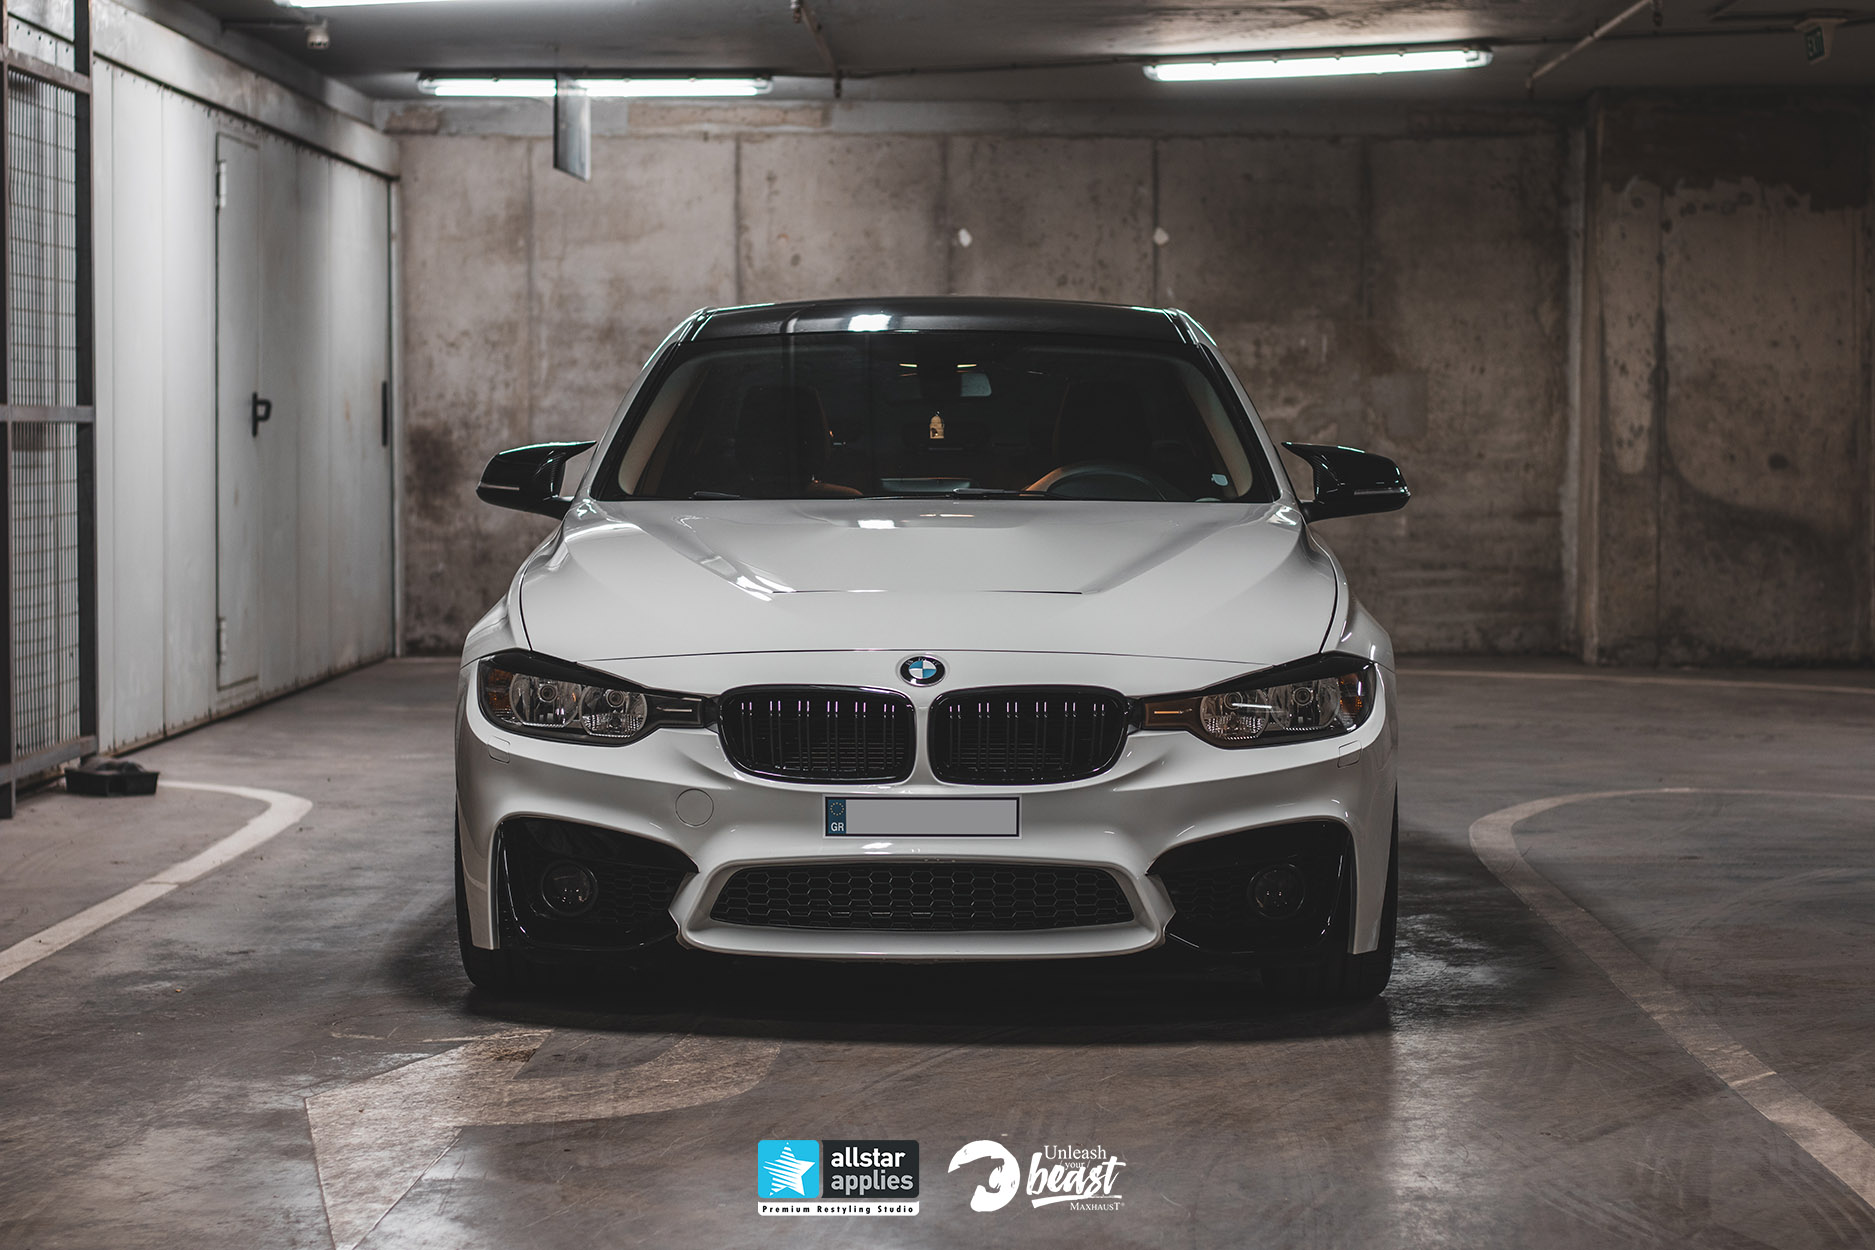 BMW 3 SERIES MAXHAUST 7